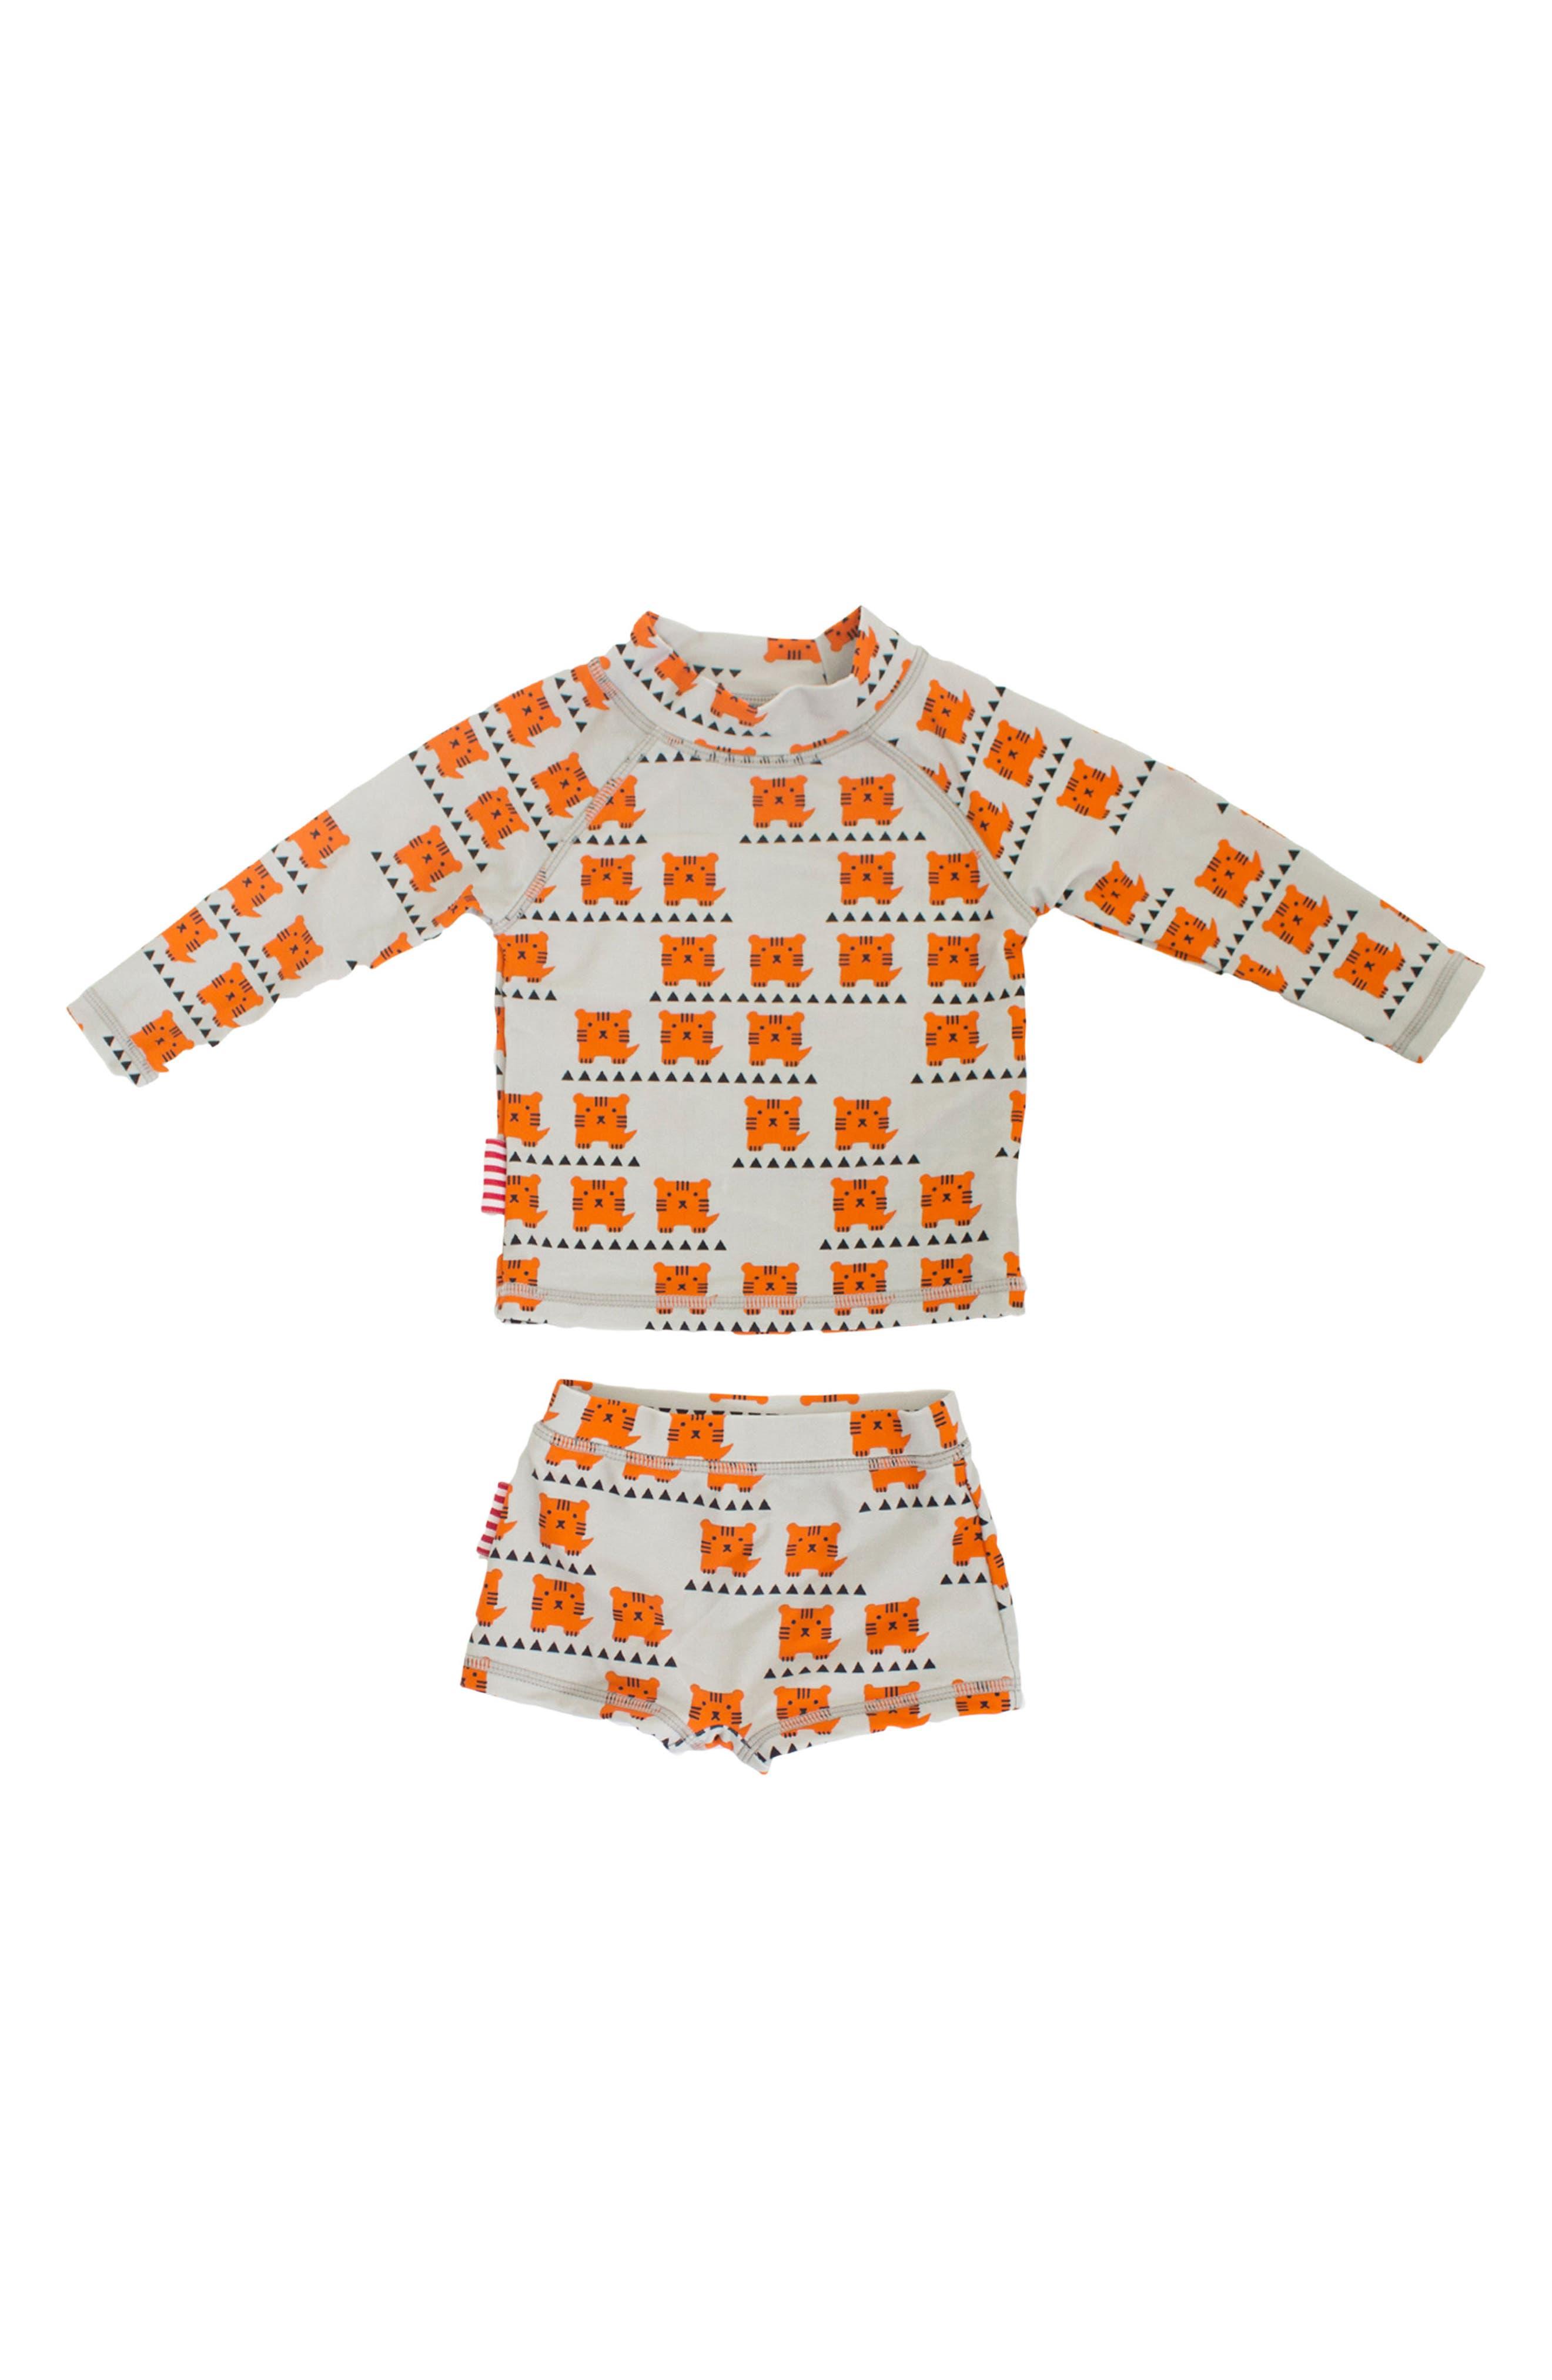 Cub In The Hub Two-Piece Rashguard Swimsuit,                         Main,                         color, Orange/ Grey